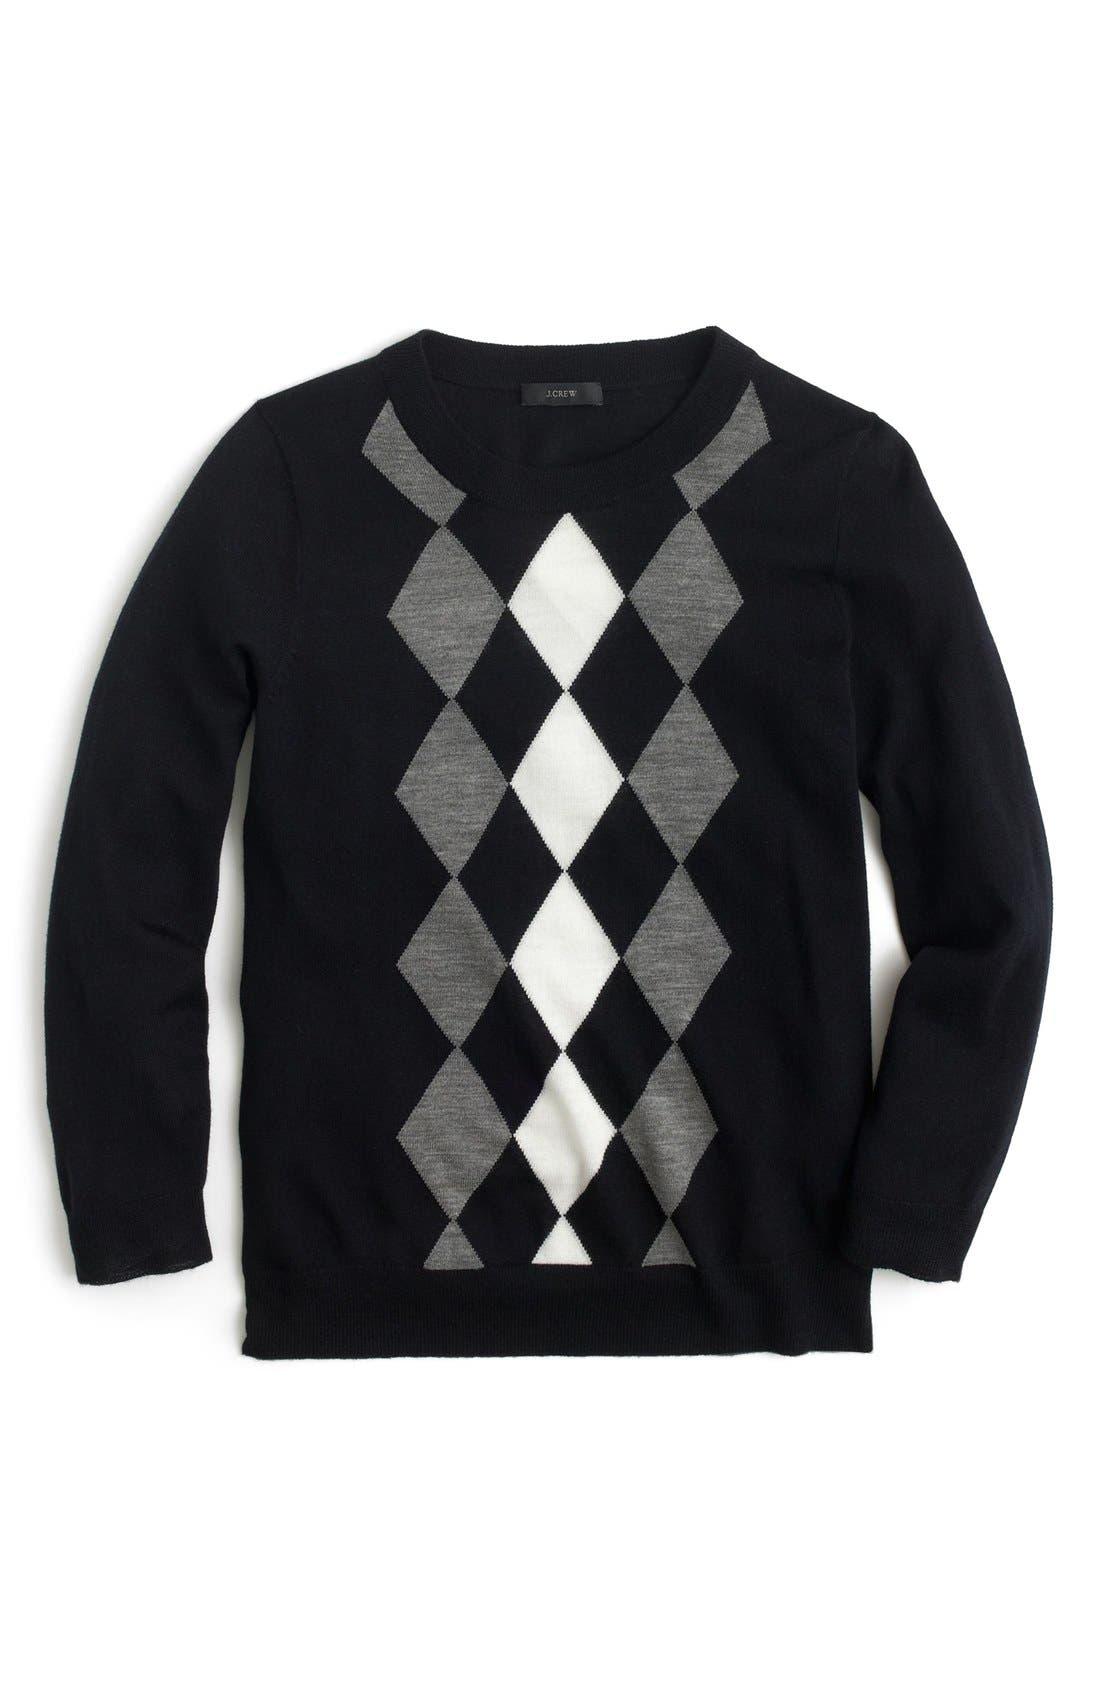 Alternate Image 1 Selected - J.Crew 'Tippi' Argyle Sweater